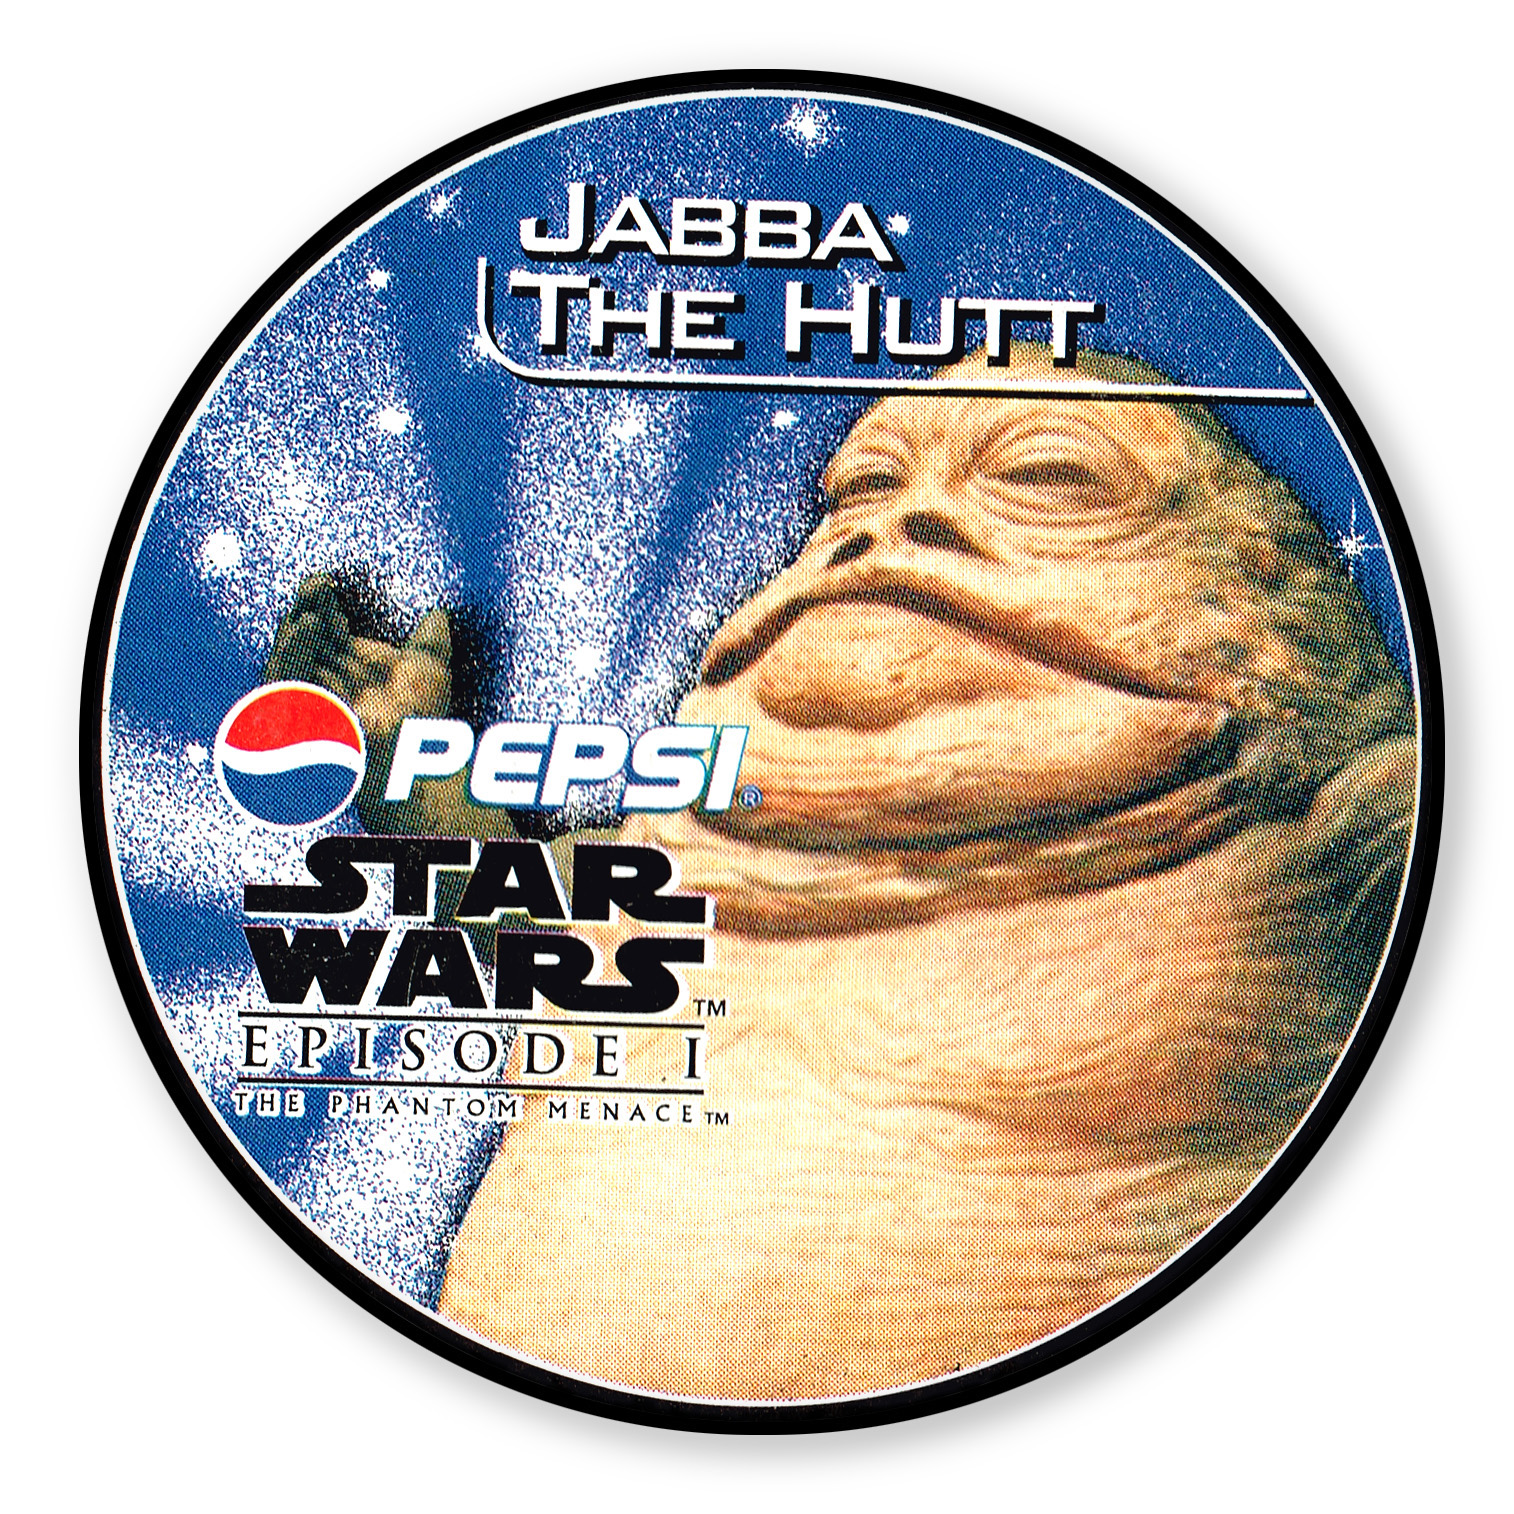 Jabba the Hut Pepsi card (NZ, 1999)